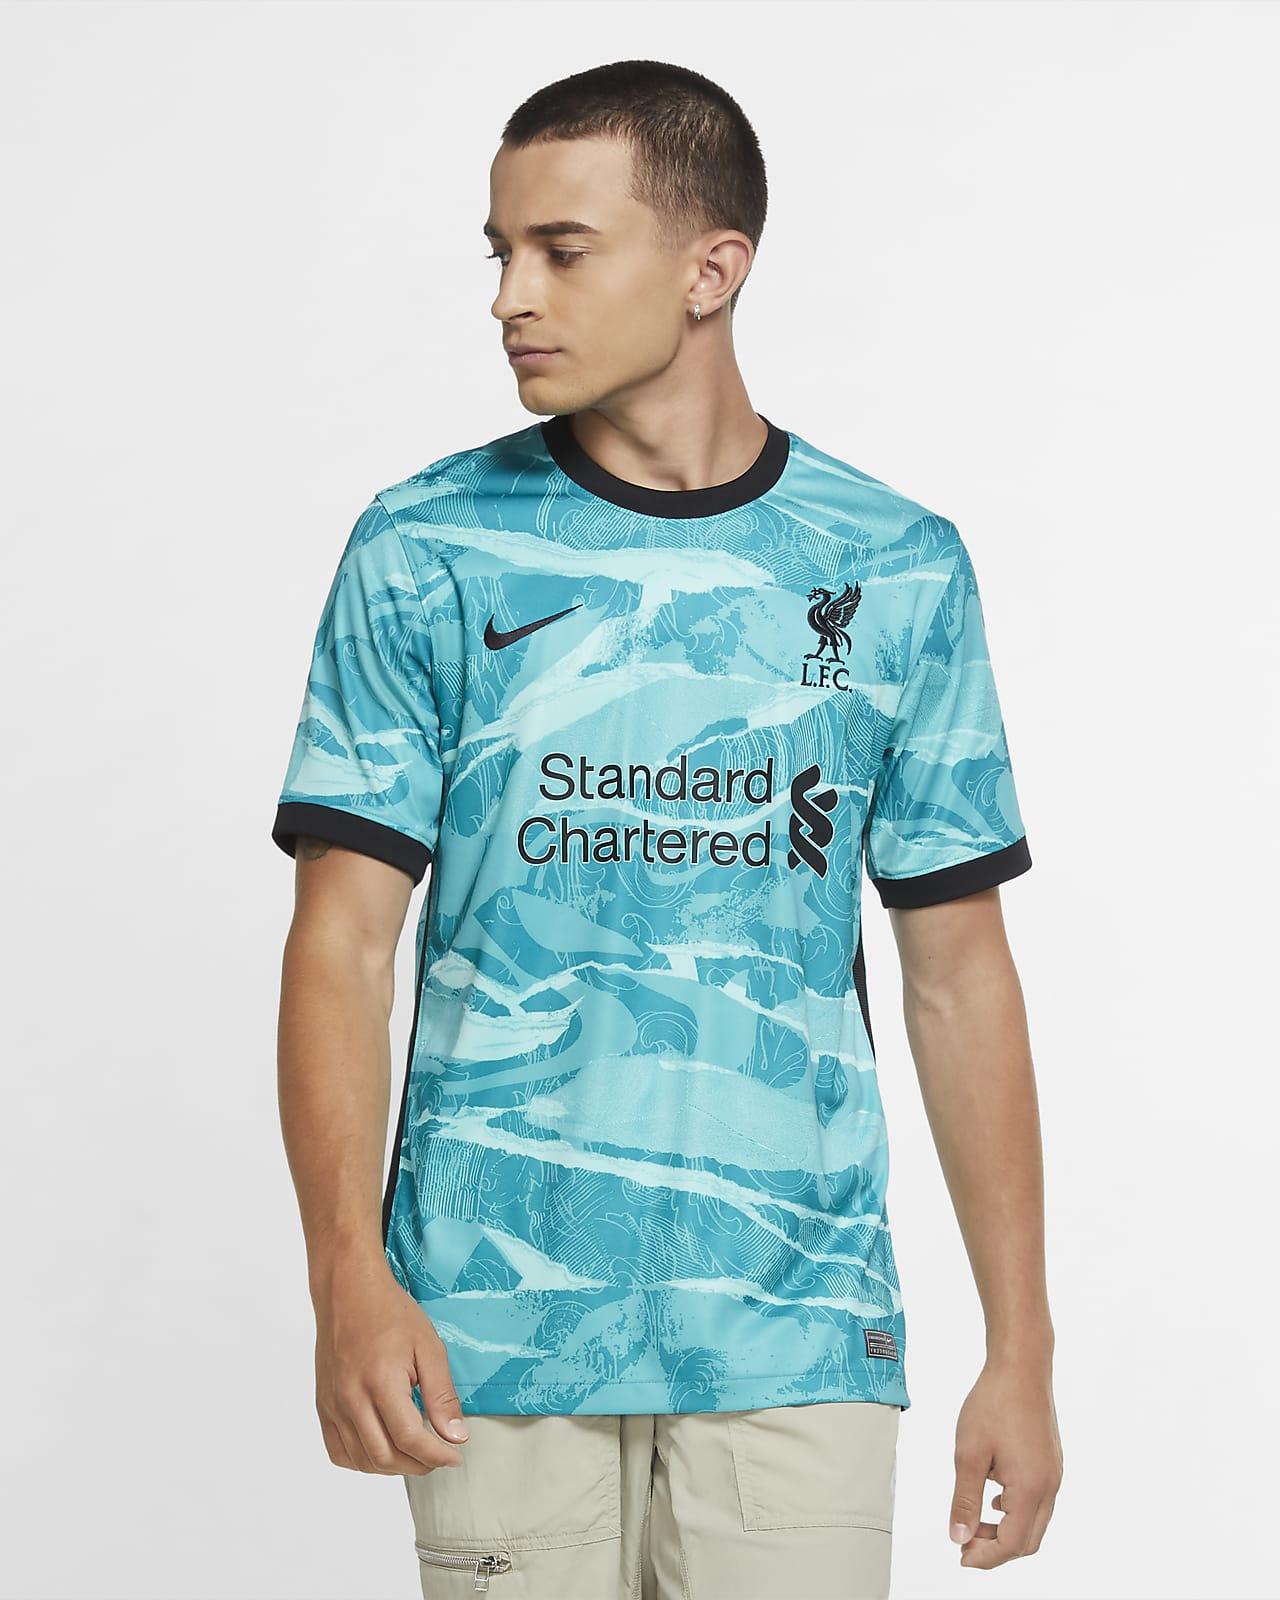 Liverpool FC 2020/21 Stadium idegenbeli férfi futballmez